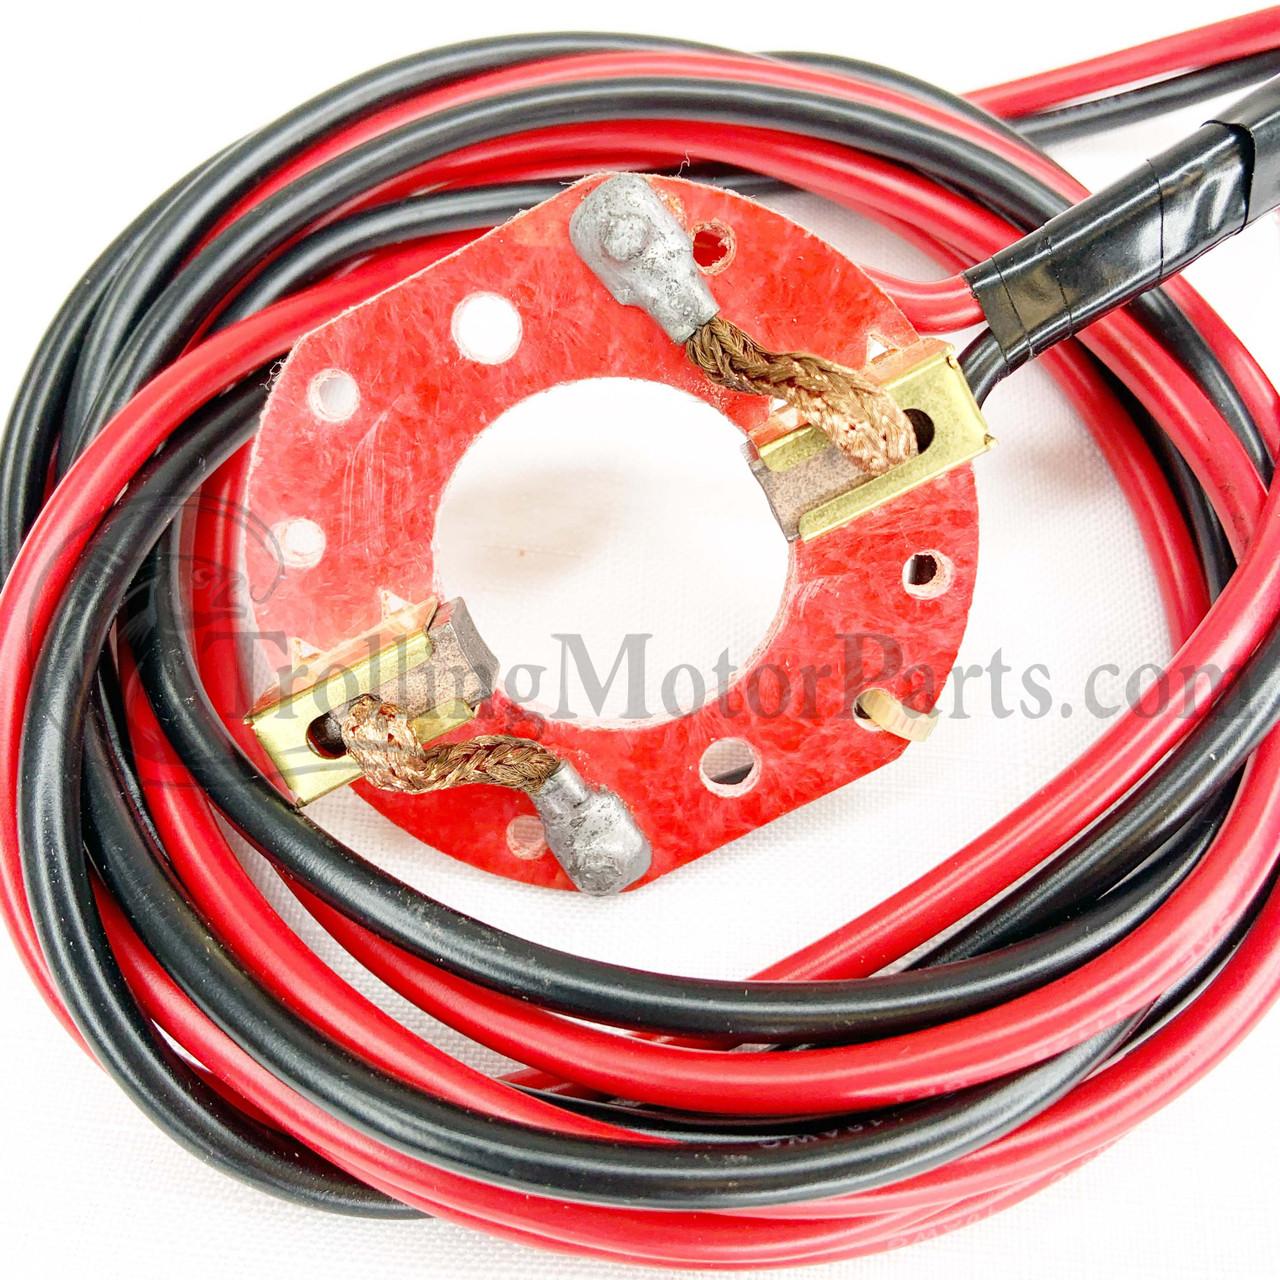 trolling motor wiring guide motor guide brush plate kit  w wires  trollingmotorparts com  motor guide brush plate kit  w wires